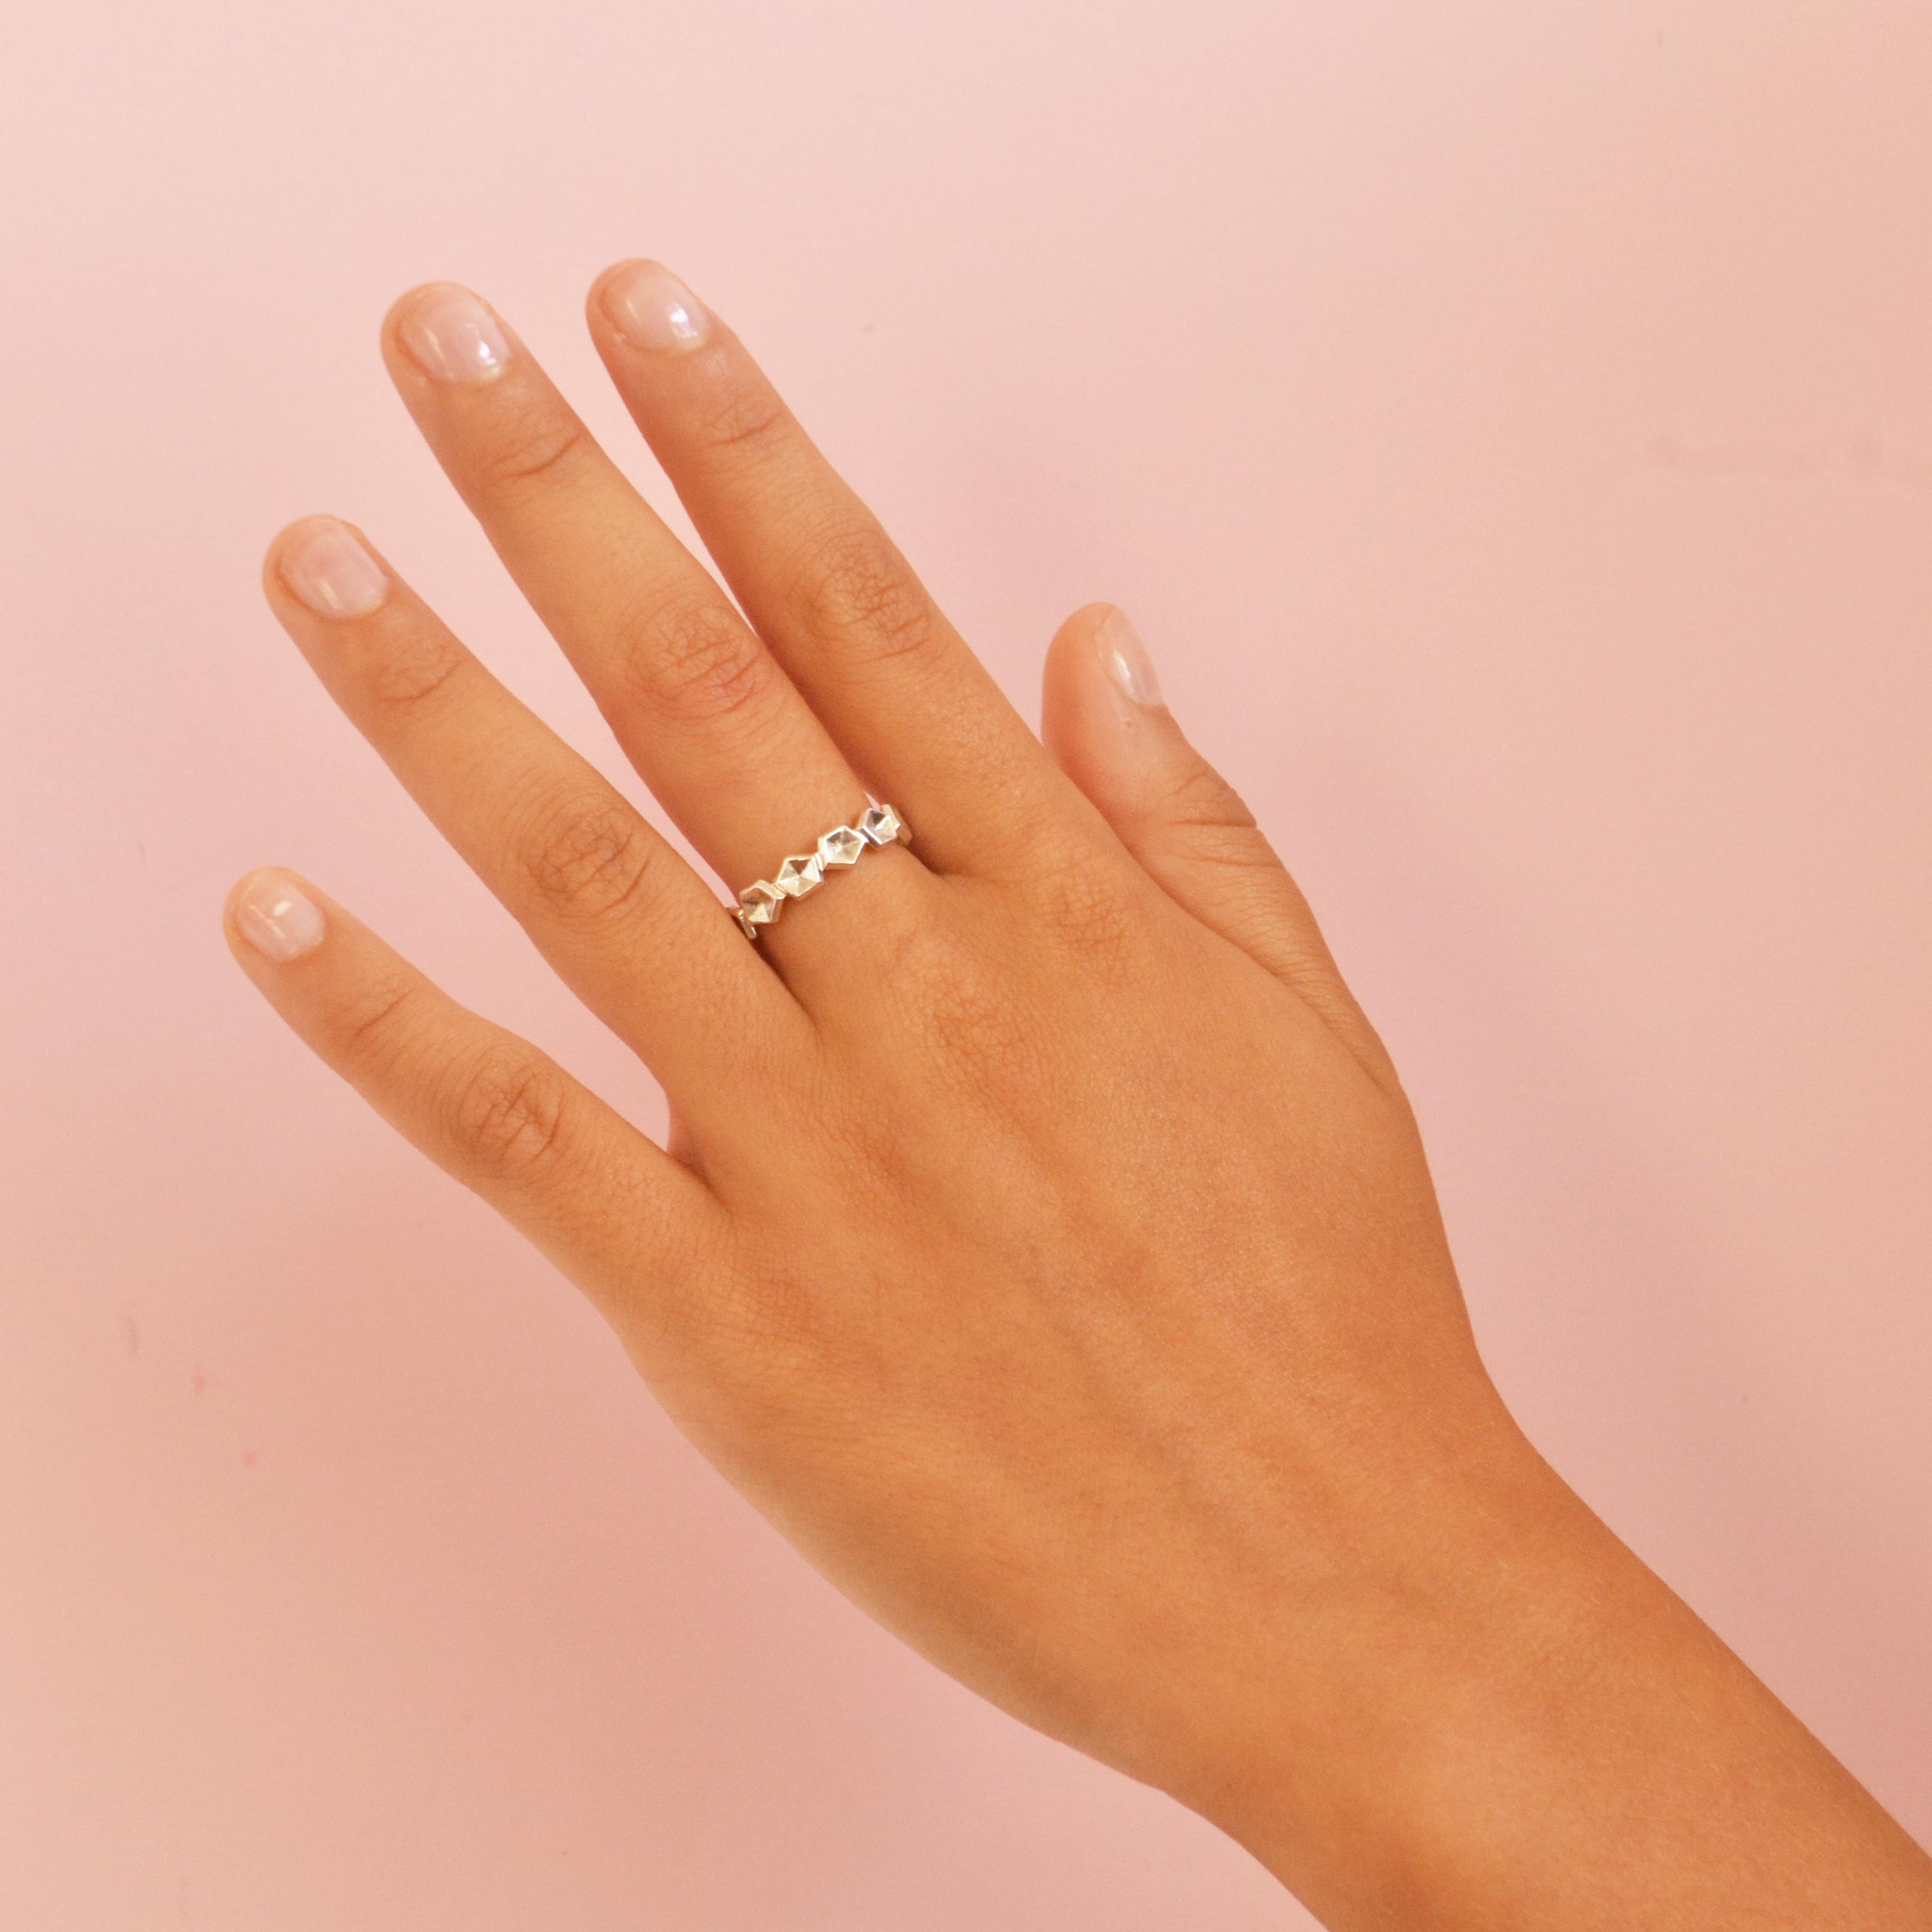 polished veretta ring on model